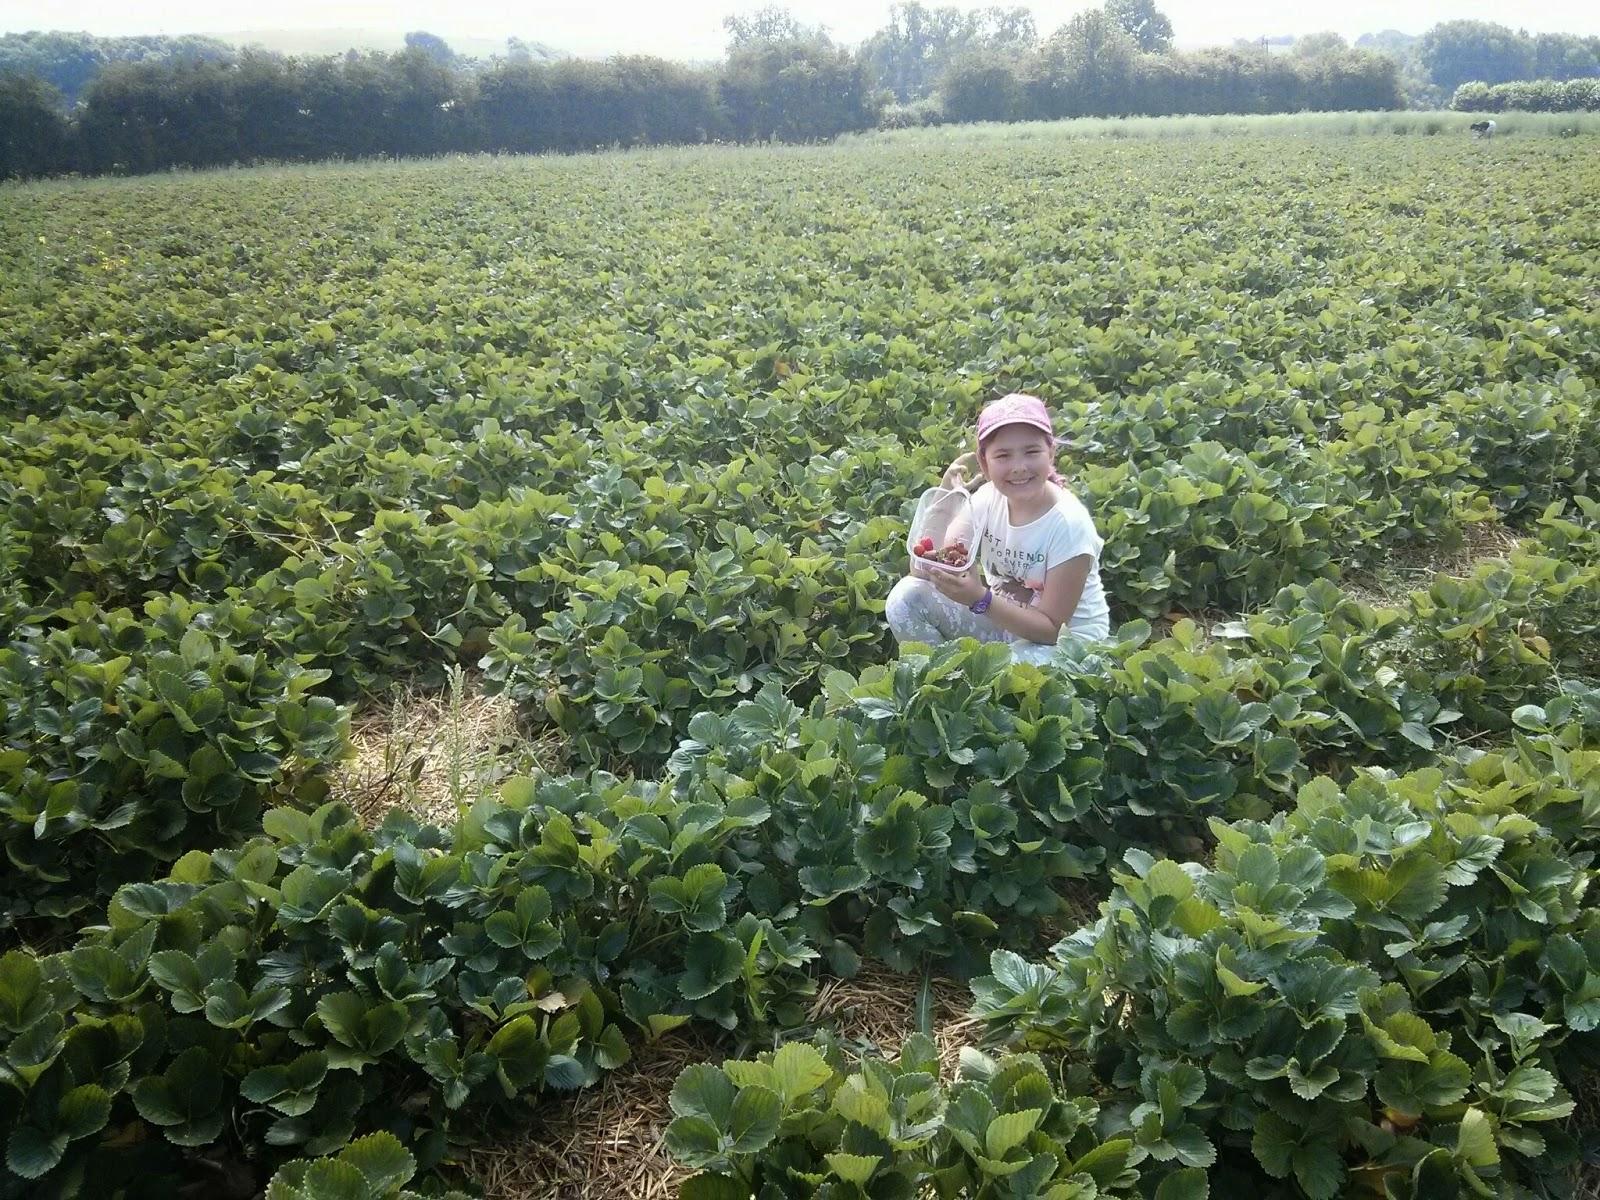 Top Ender picking Strawberries